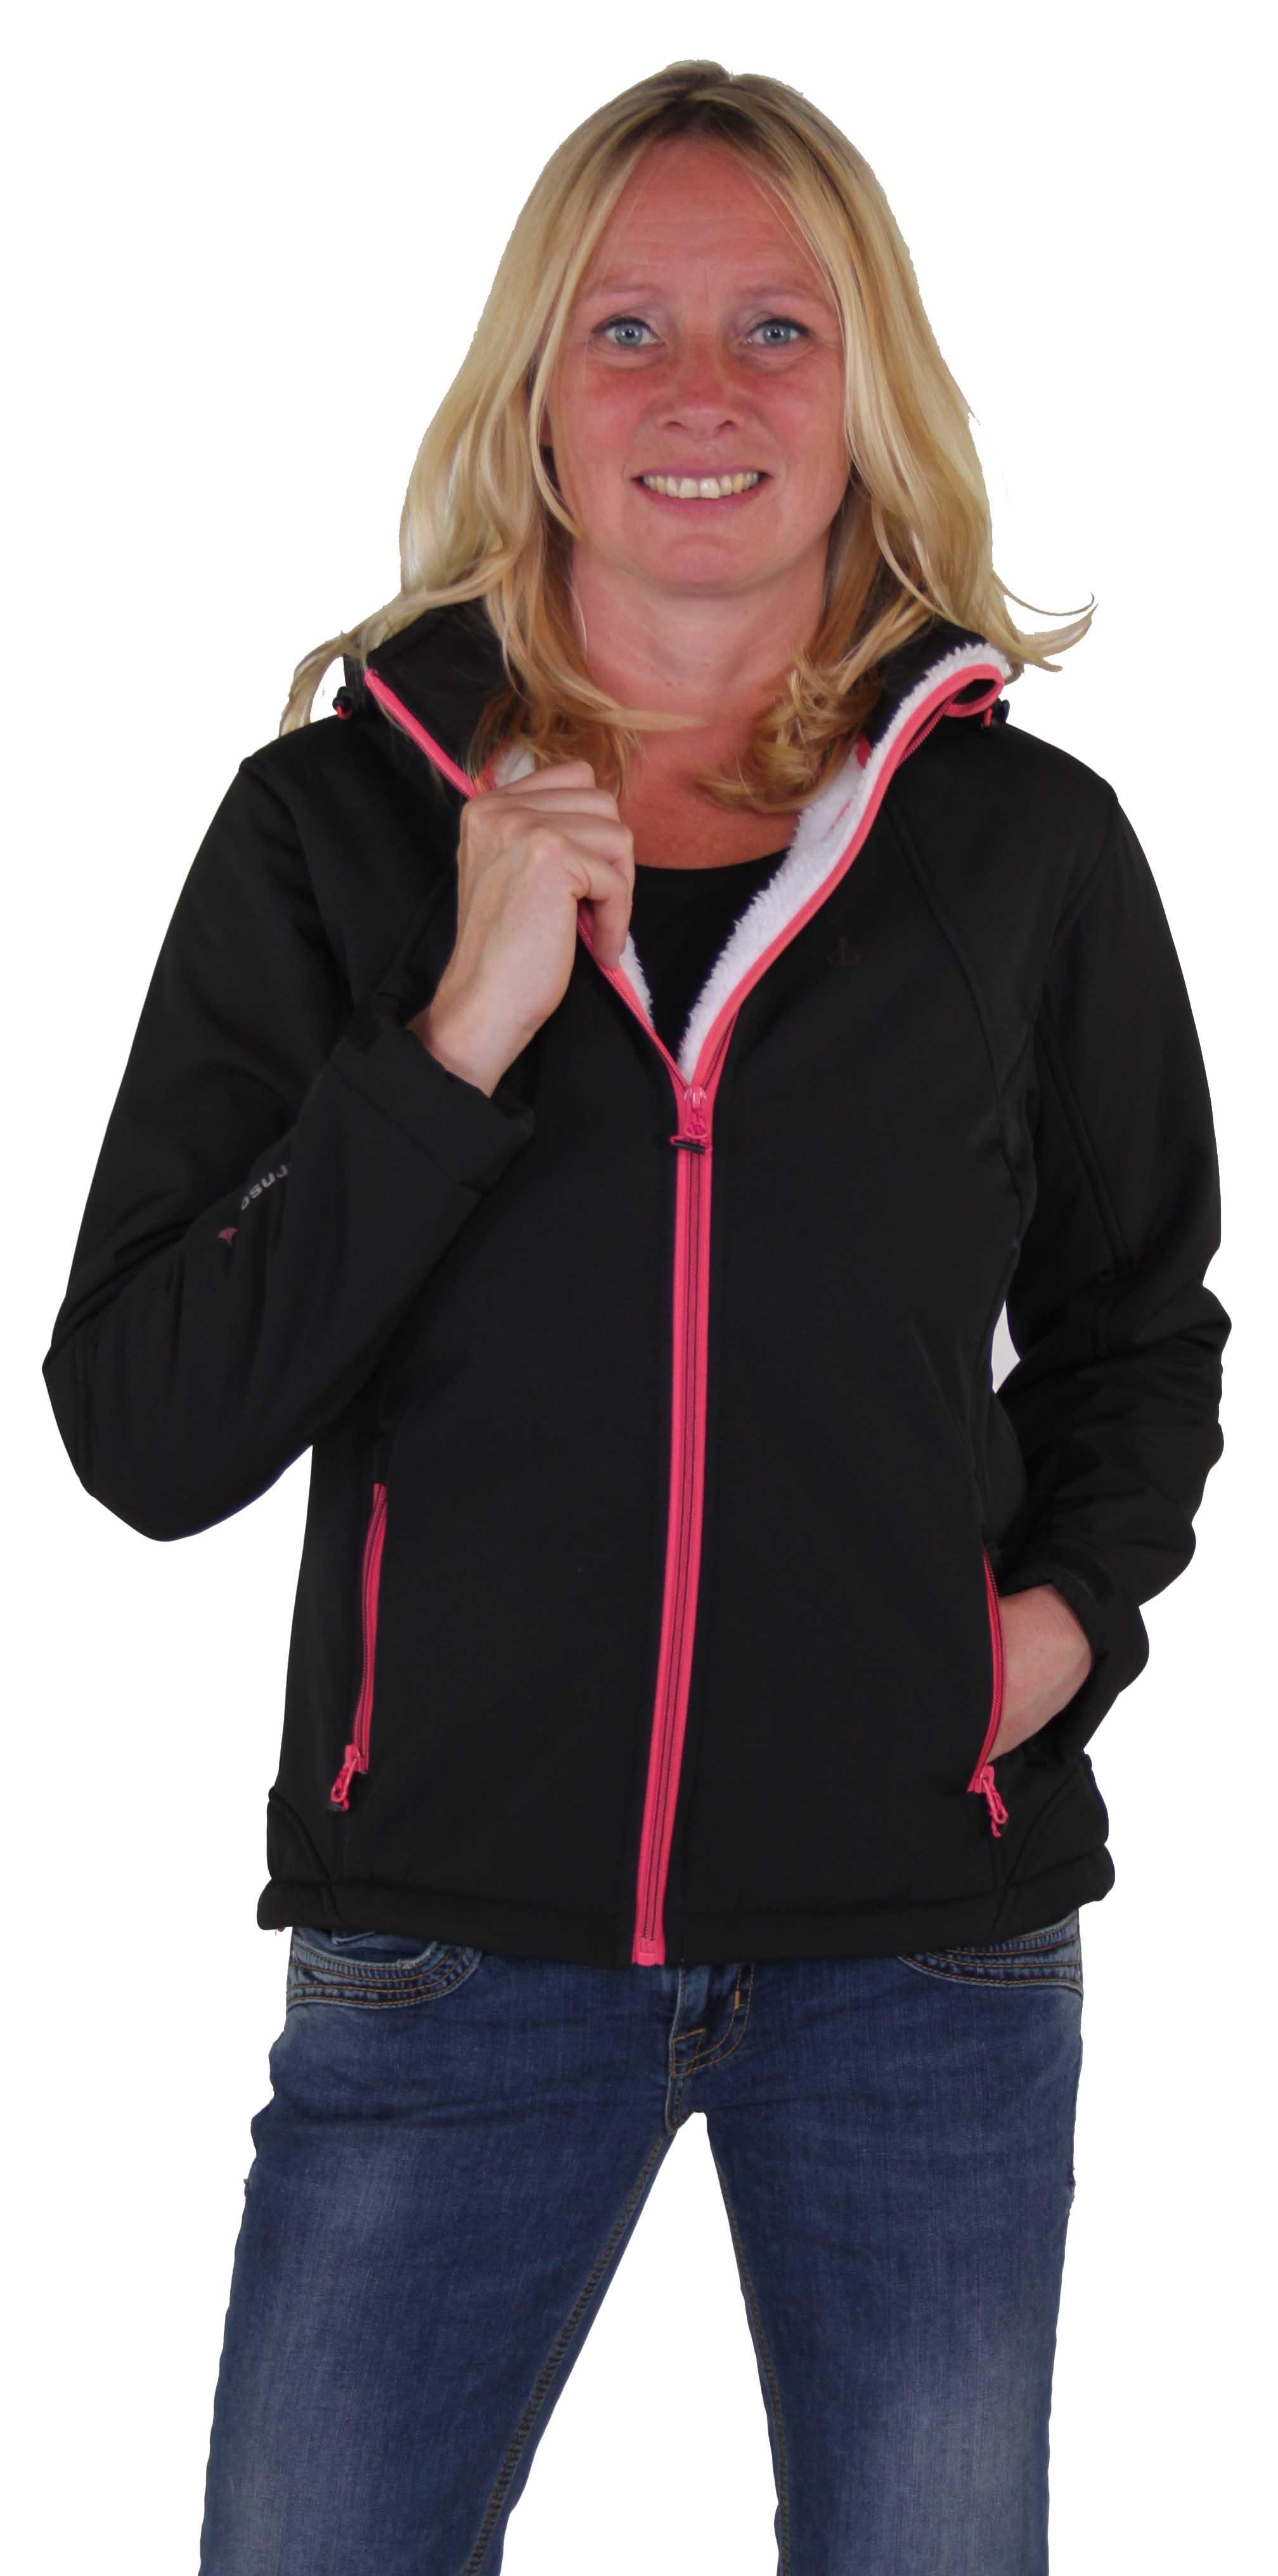 Zwarte teddy gevoerde dames softshell jas winter kopen? - Outdoorkleding - Bjornson.nl